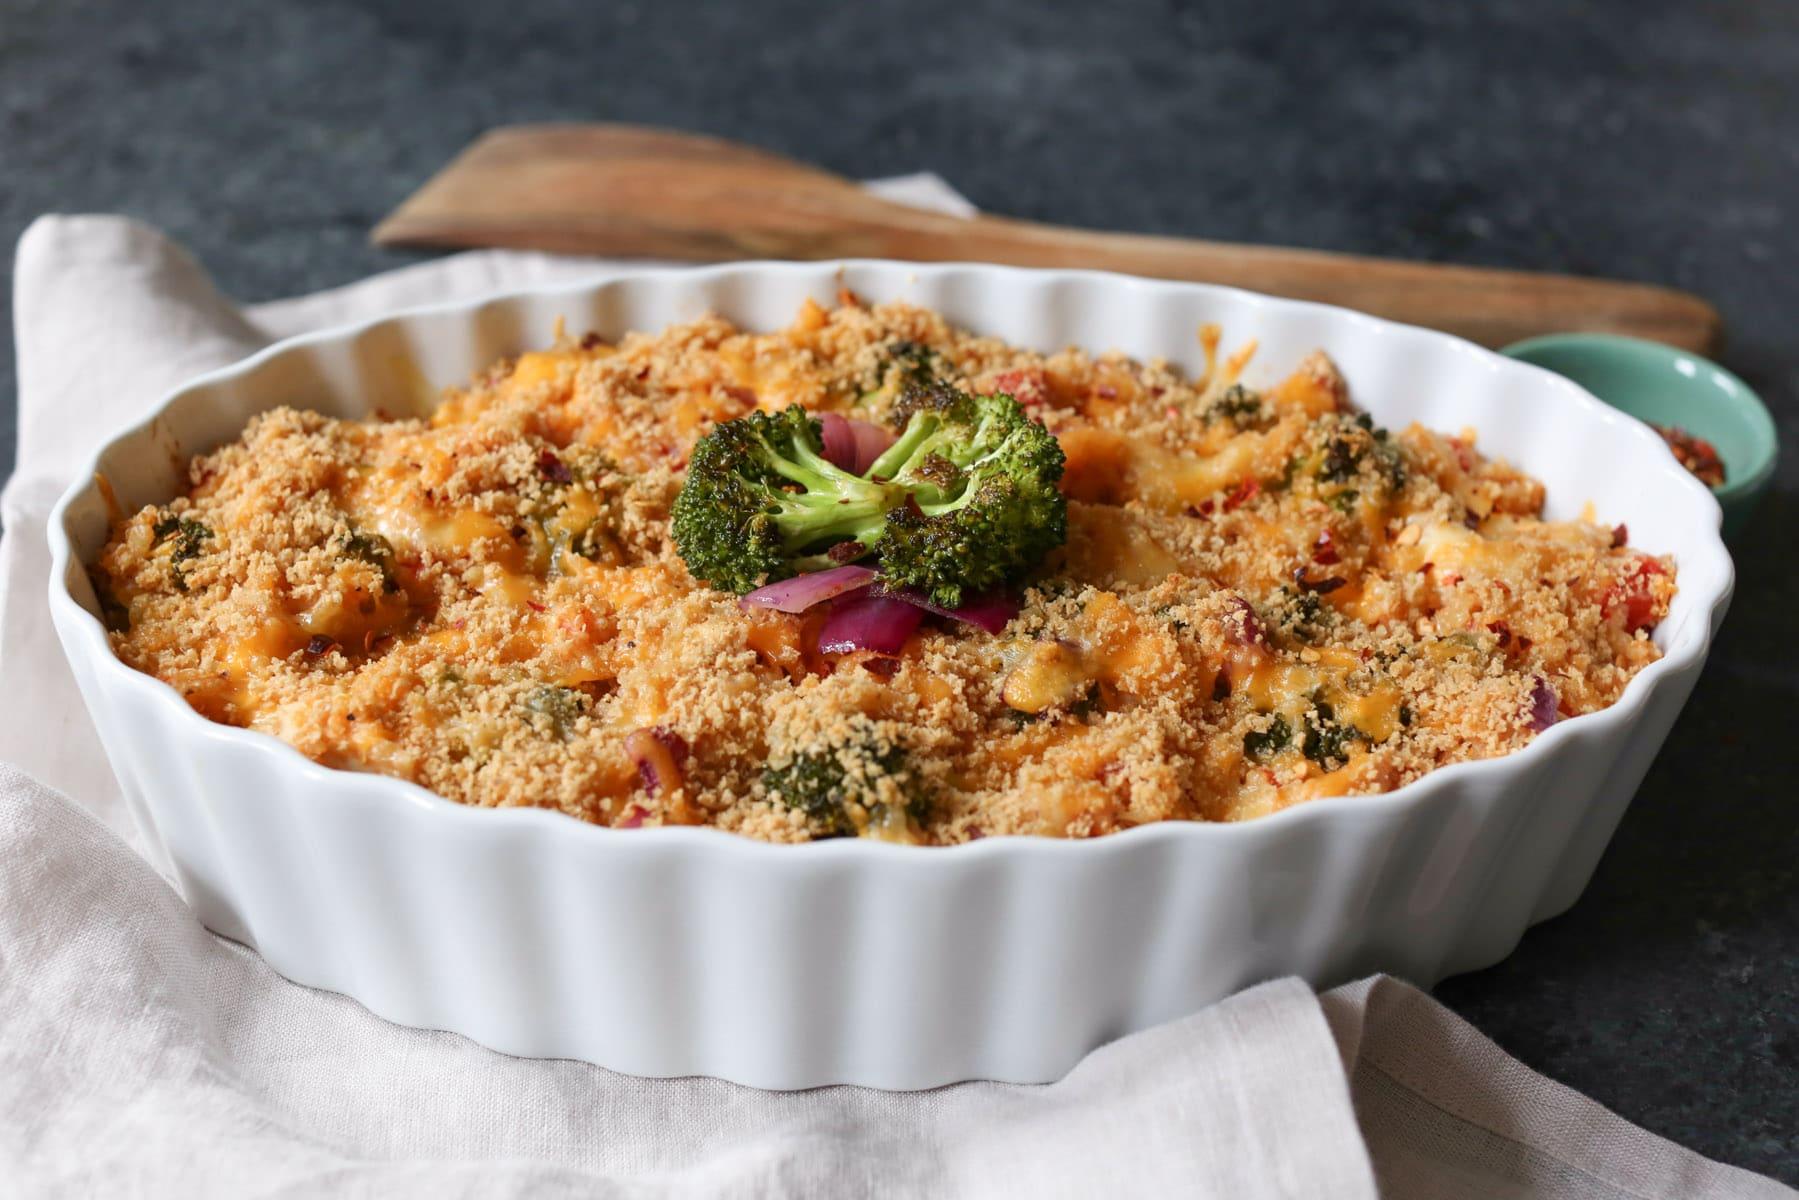 Roasted-Broccoli-Chicken-Cheddar-Quinoa-Bake-6